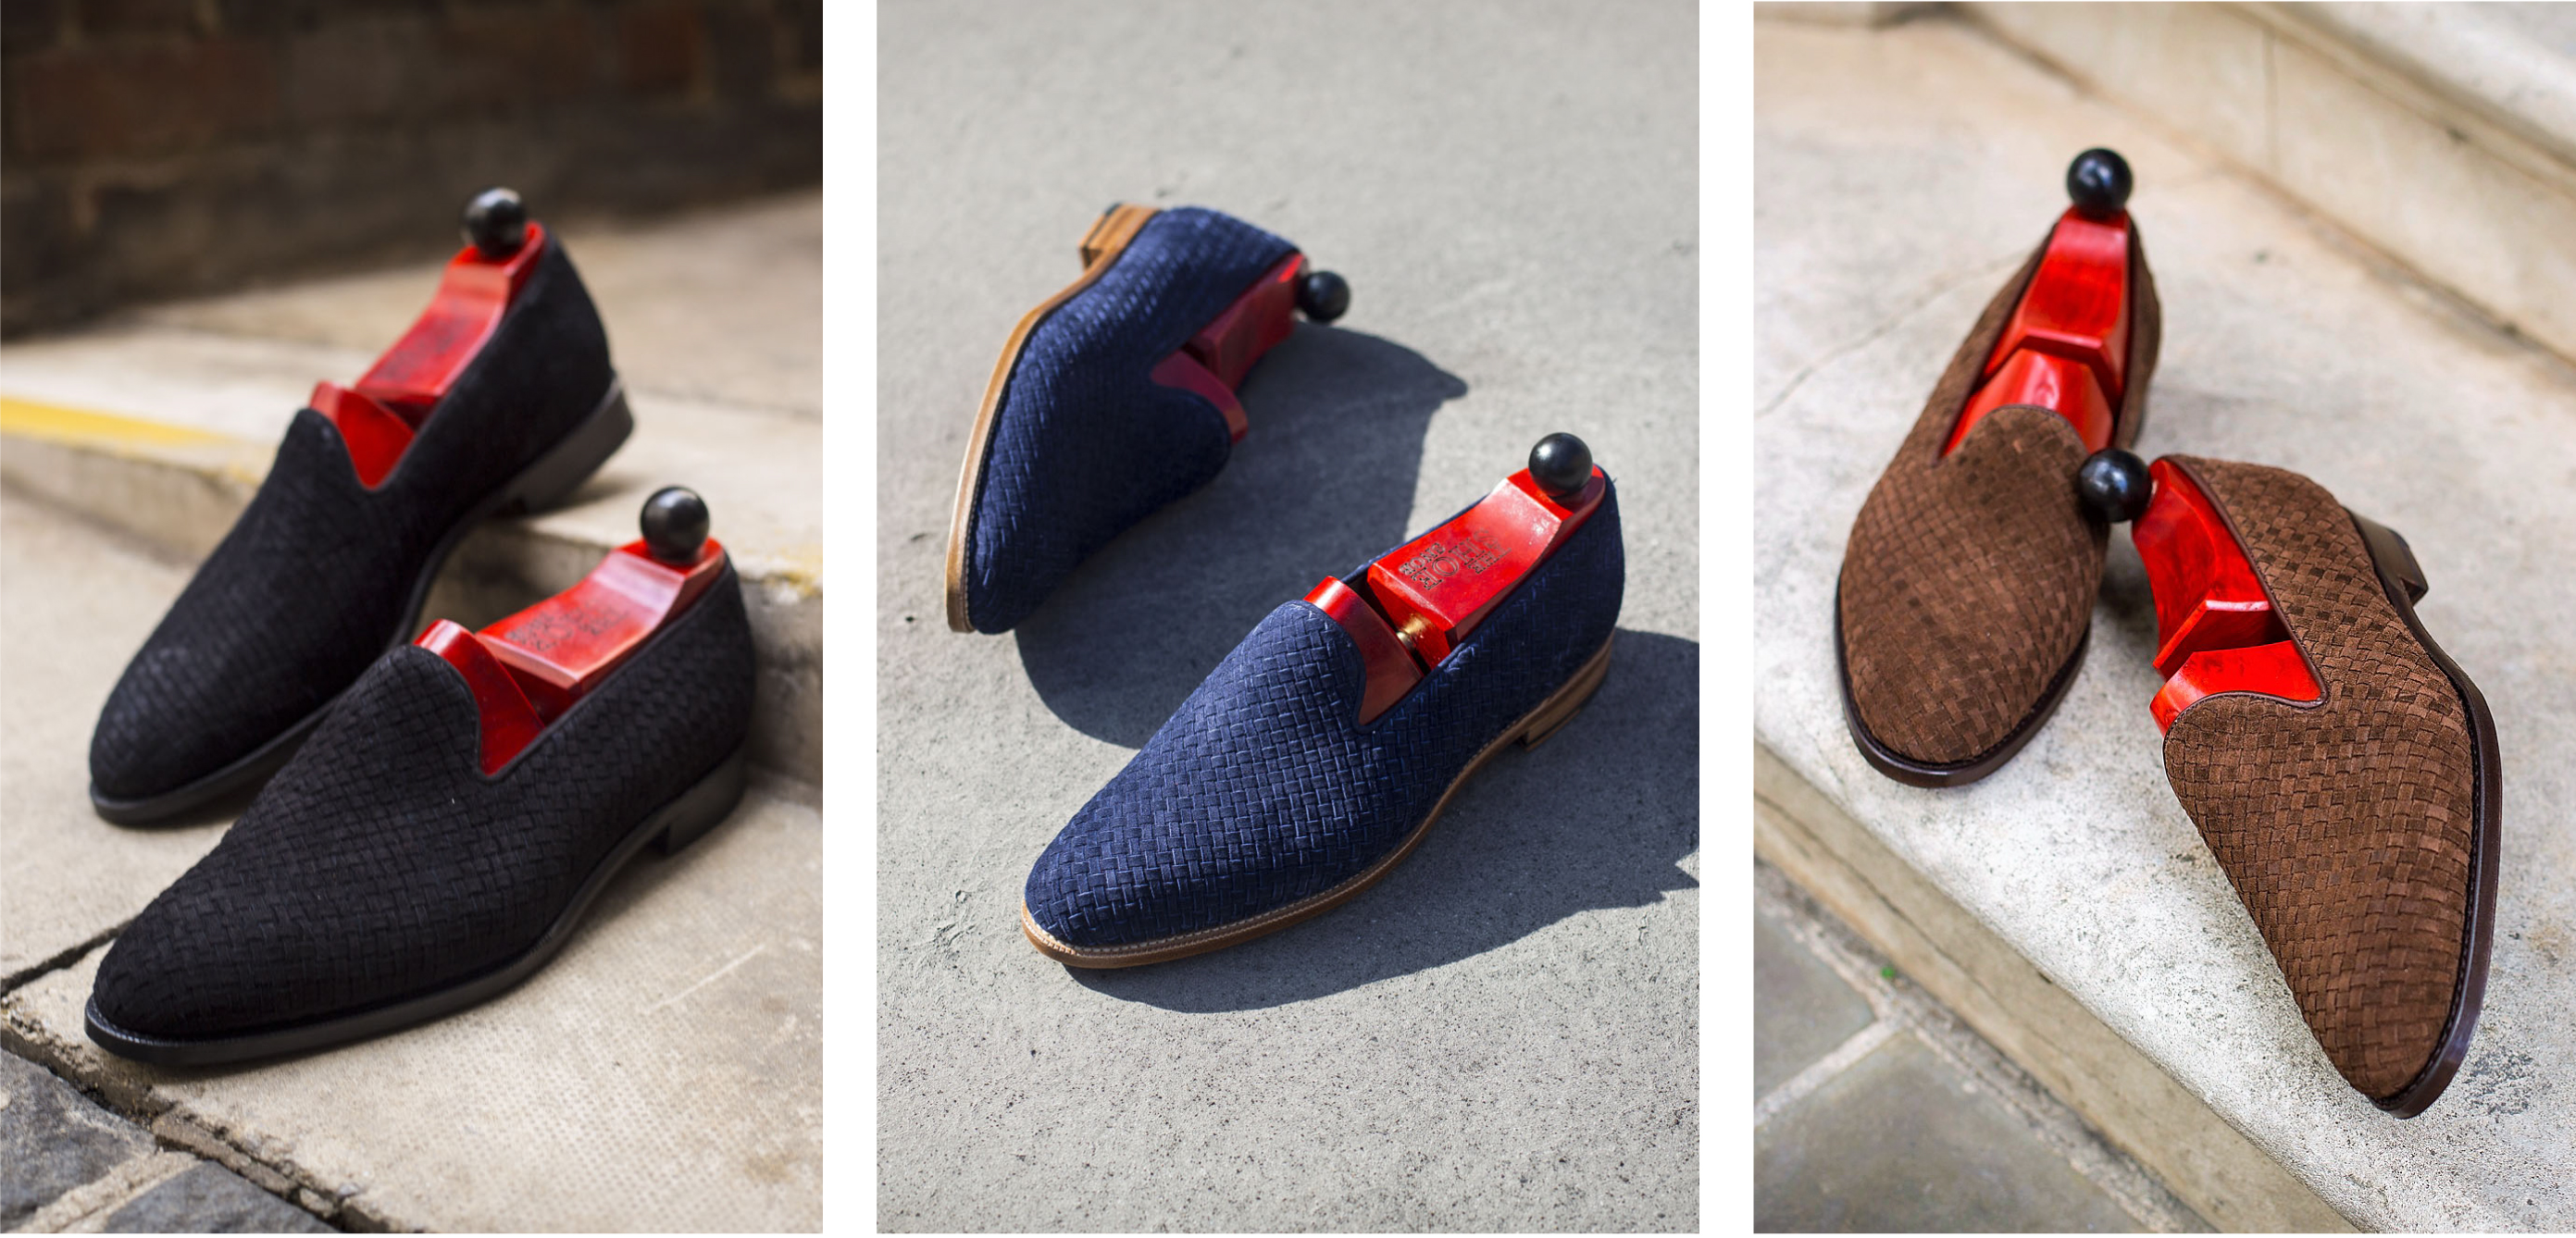 j-fitzpatrick-footwear-banner-loafer-long-2-2019.jpg